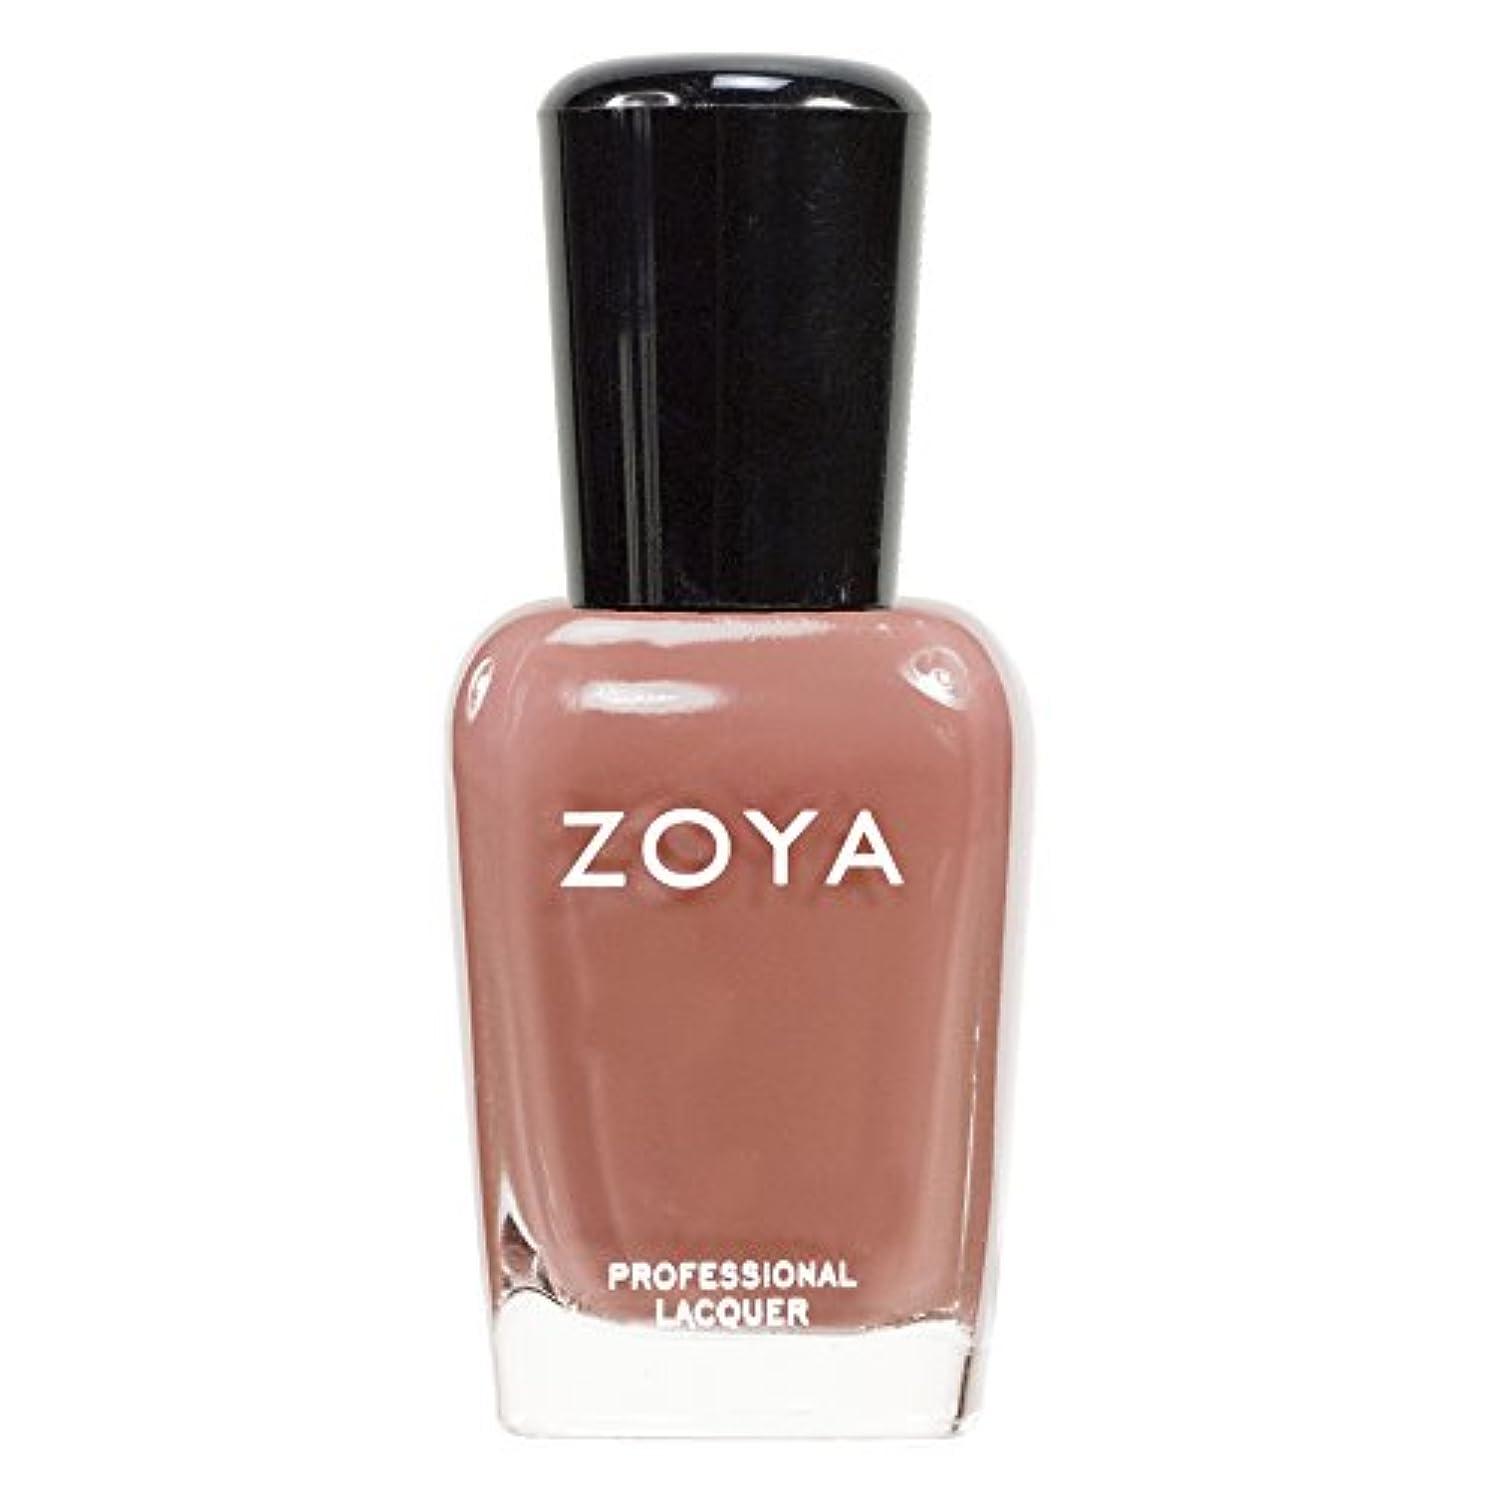 ZOYA ゾーヤ ネイルカラーZP139 FLOWIE フラーウィー 15ml 上品なライトブラウン マット 爪にやさしいネイルラッカーマニキュア